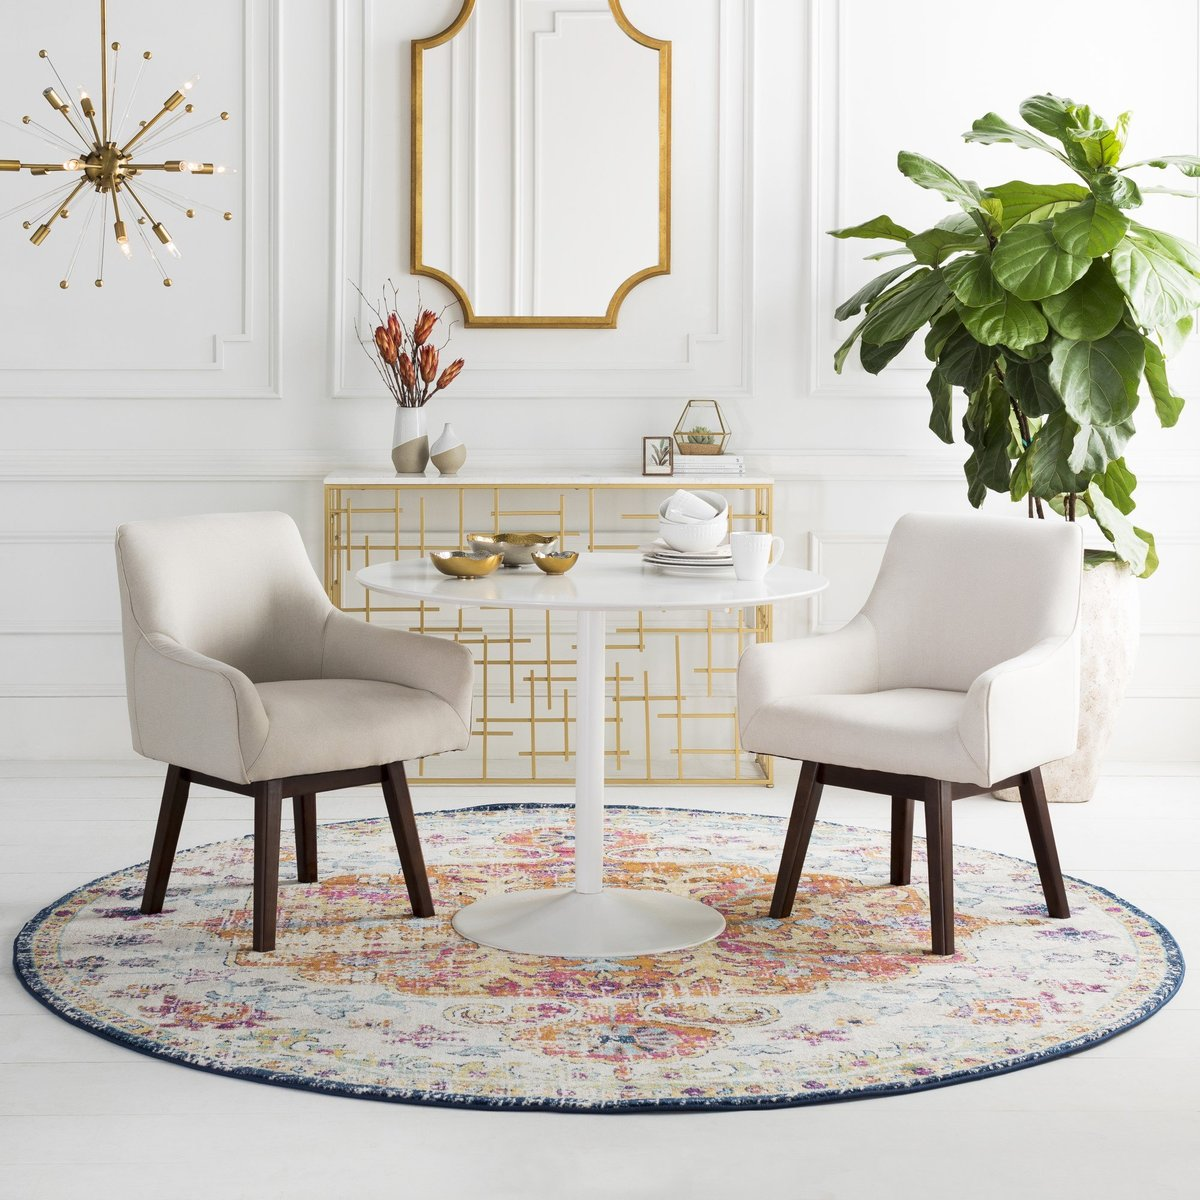 Lovely Nook Dining Room Decor Ideas